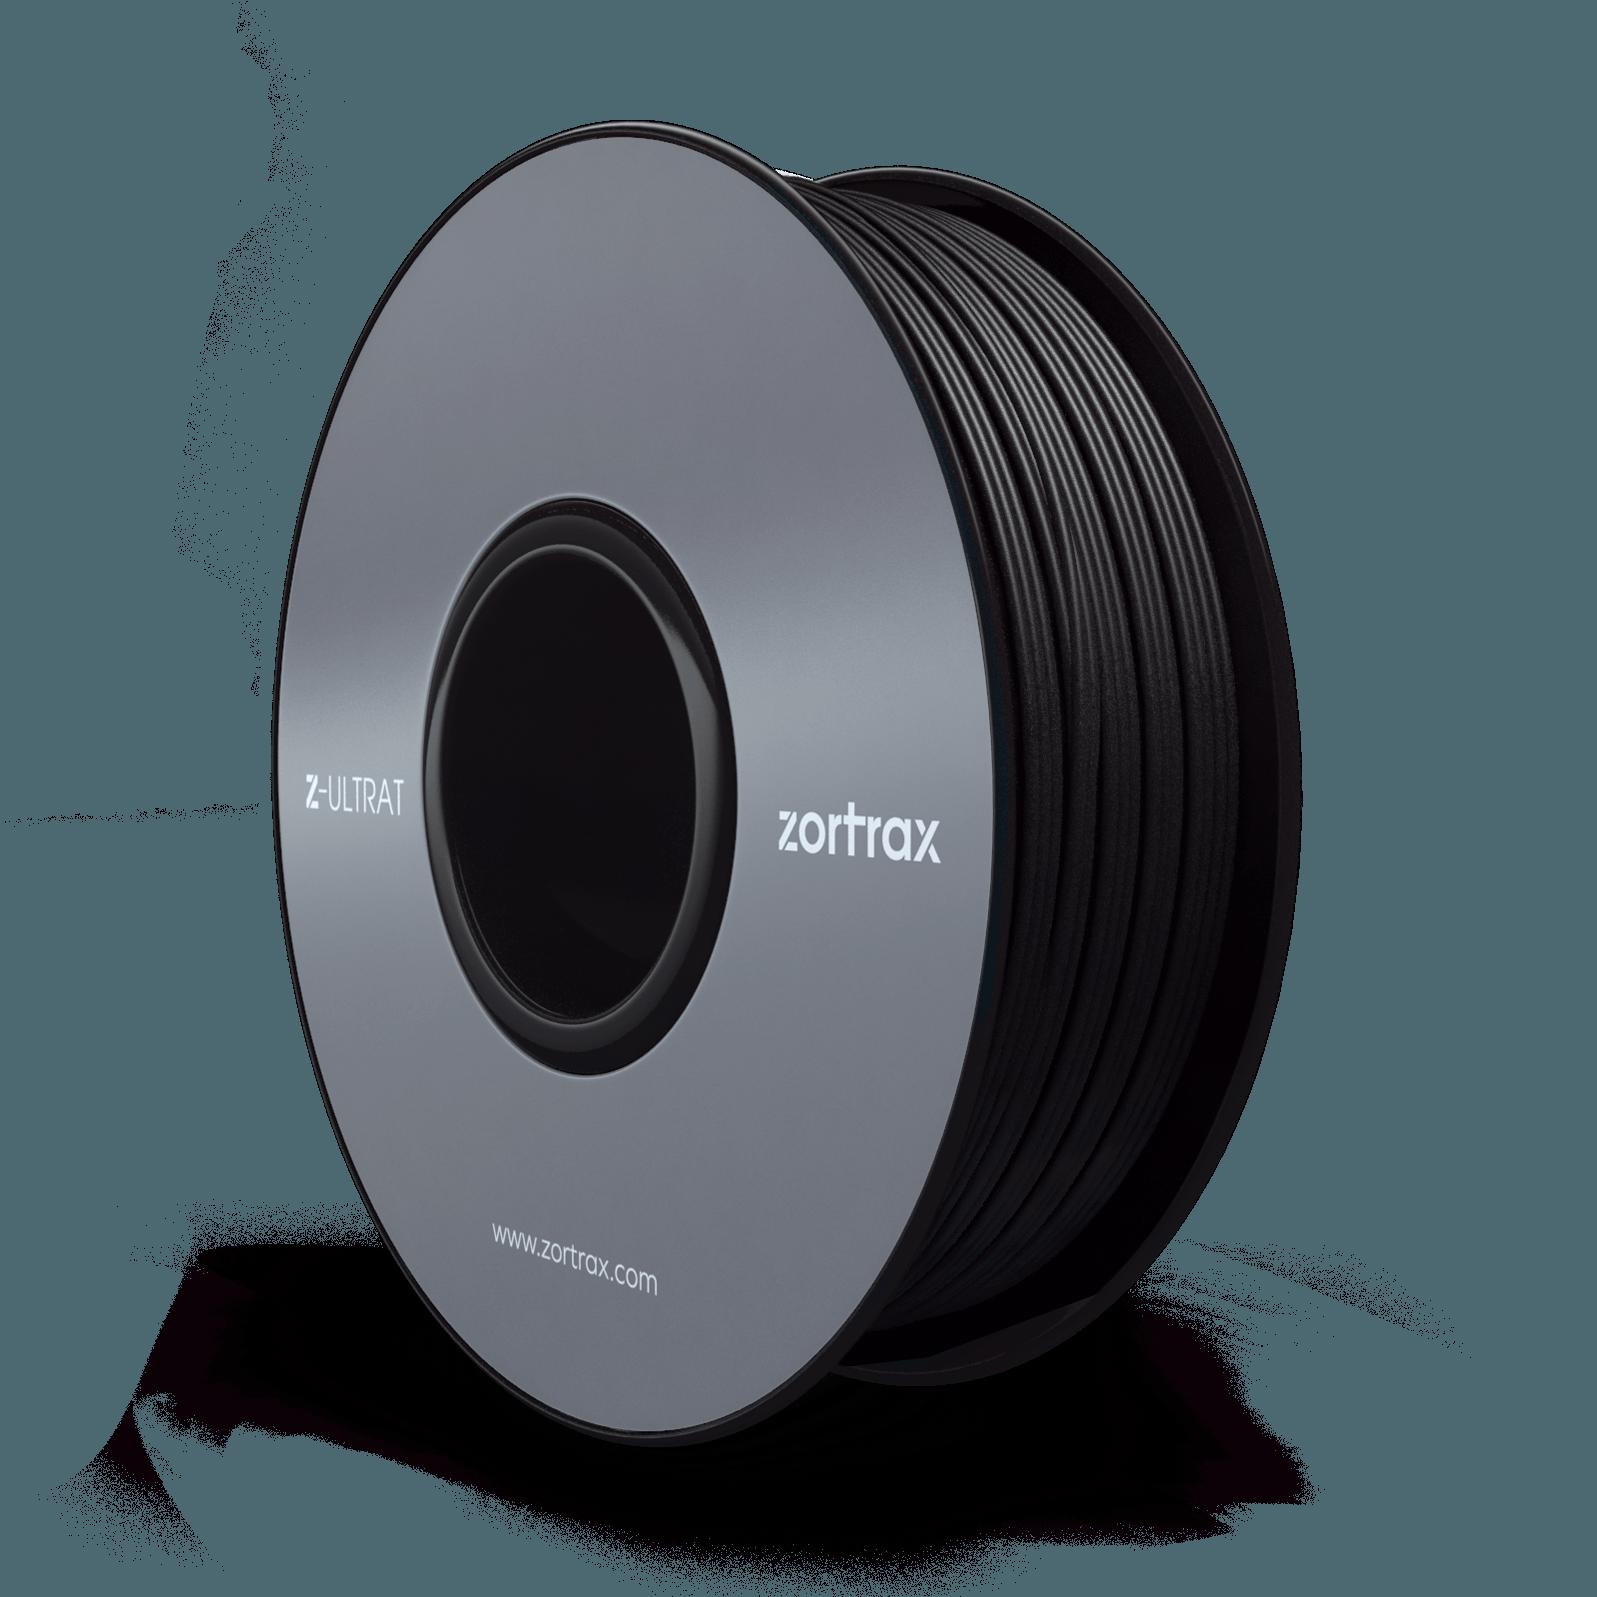 Z-ULTRAT Pure Black